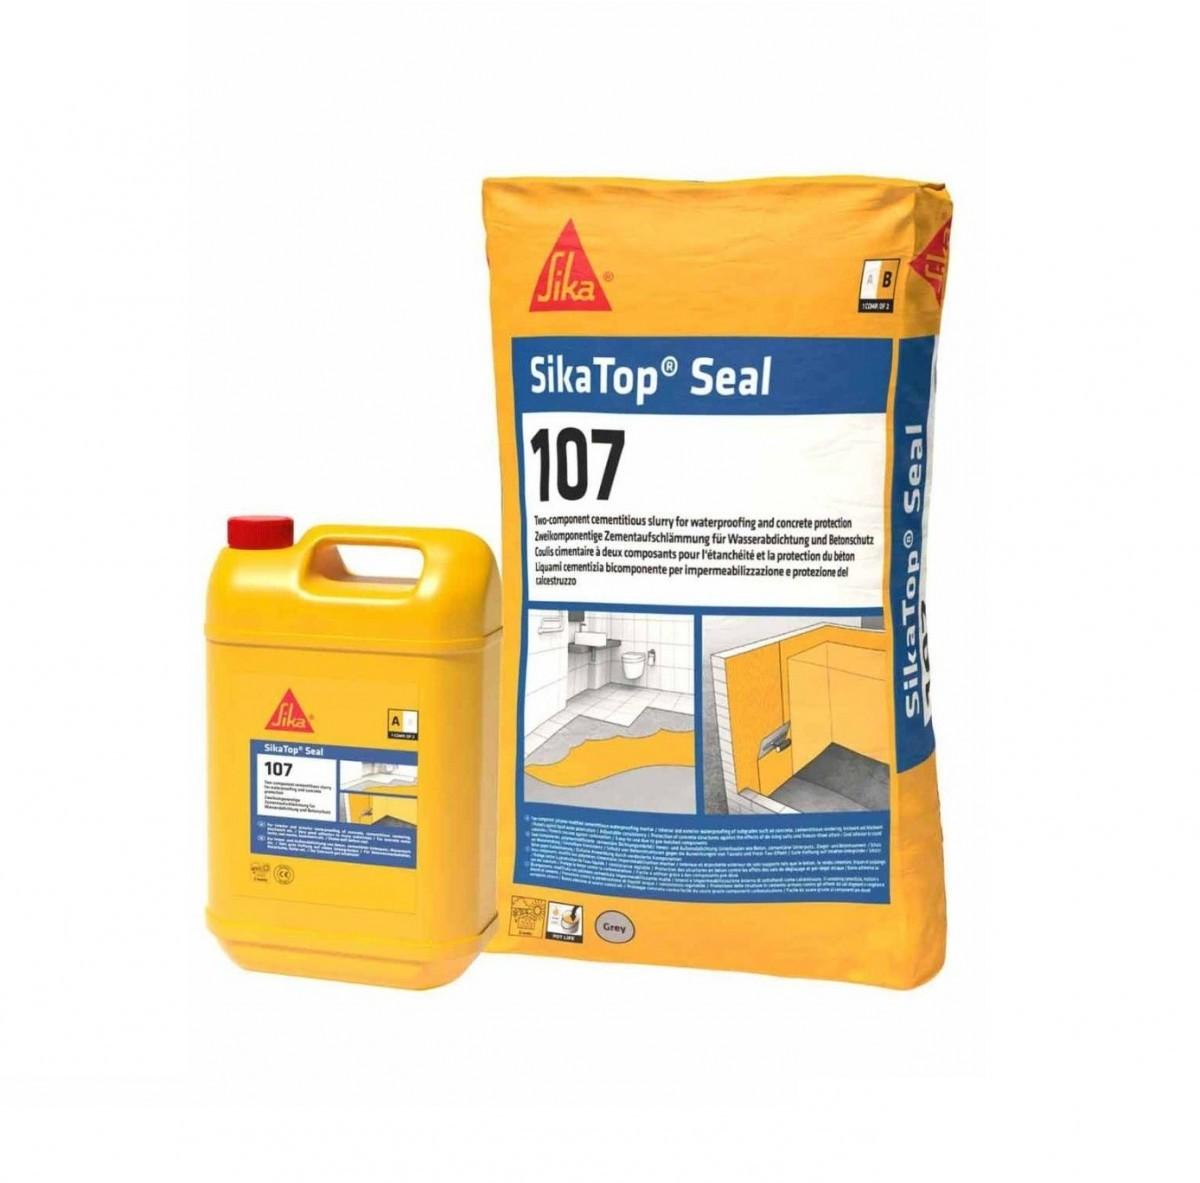 Гидроизоляция обмазочная SikaTop Seal 107 комплект, 25 кг